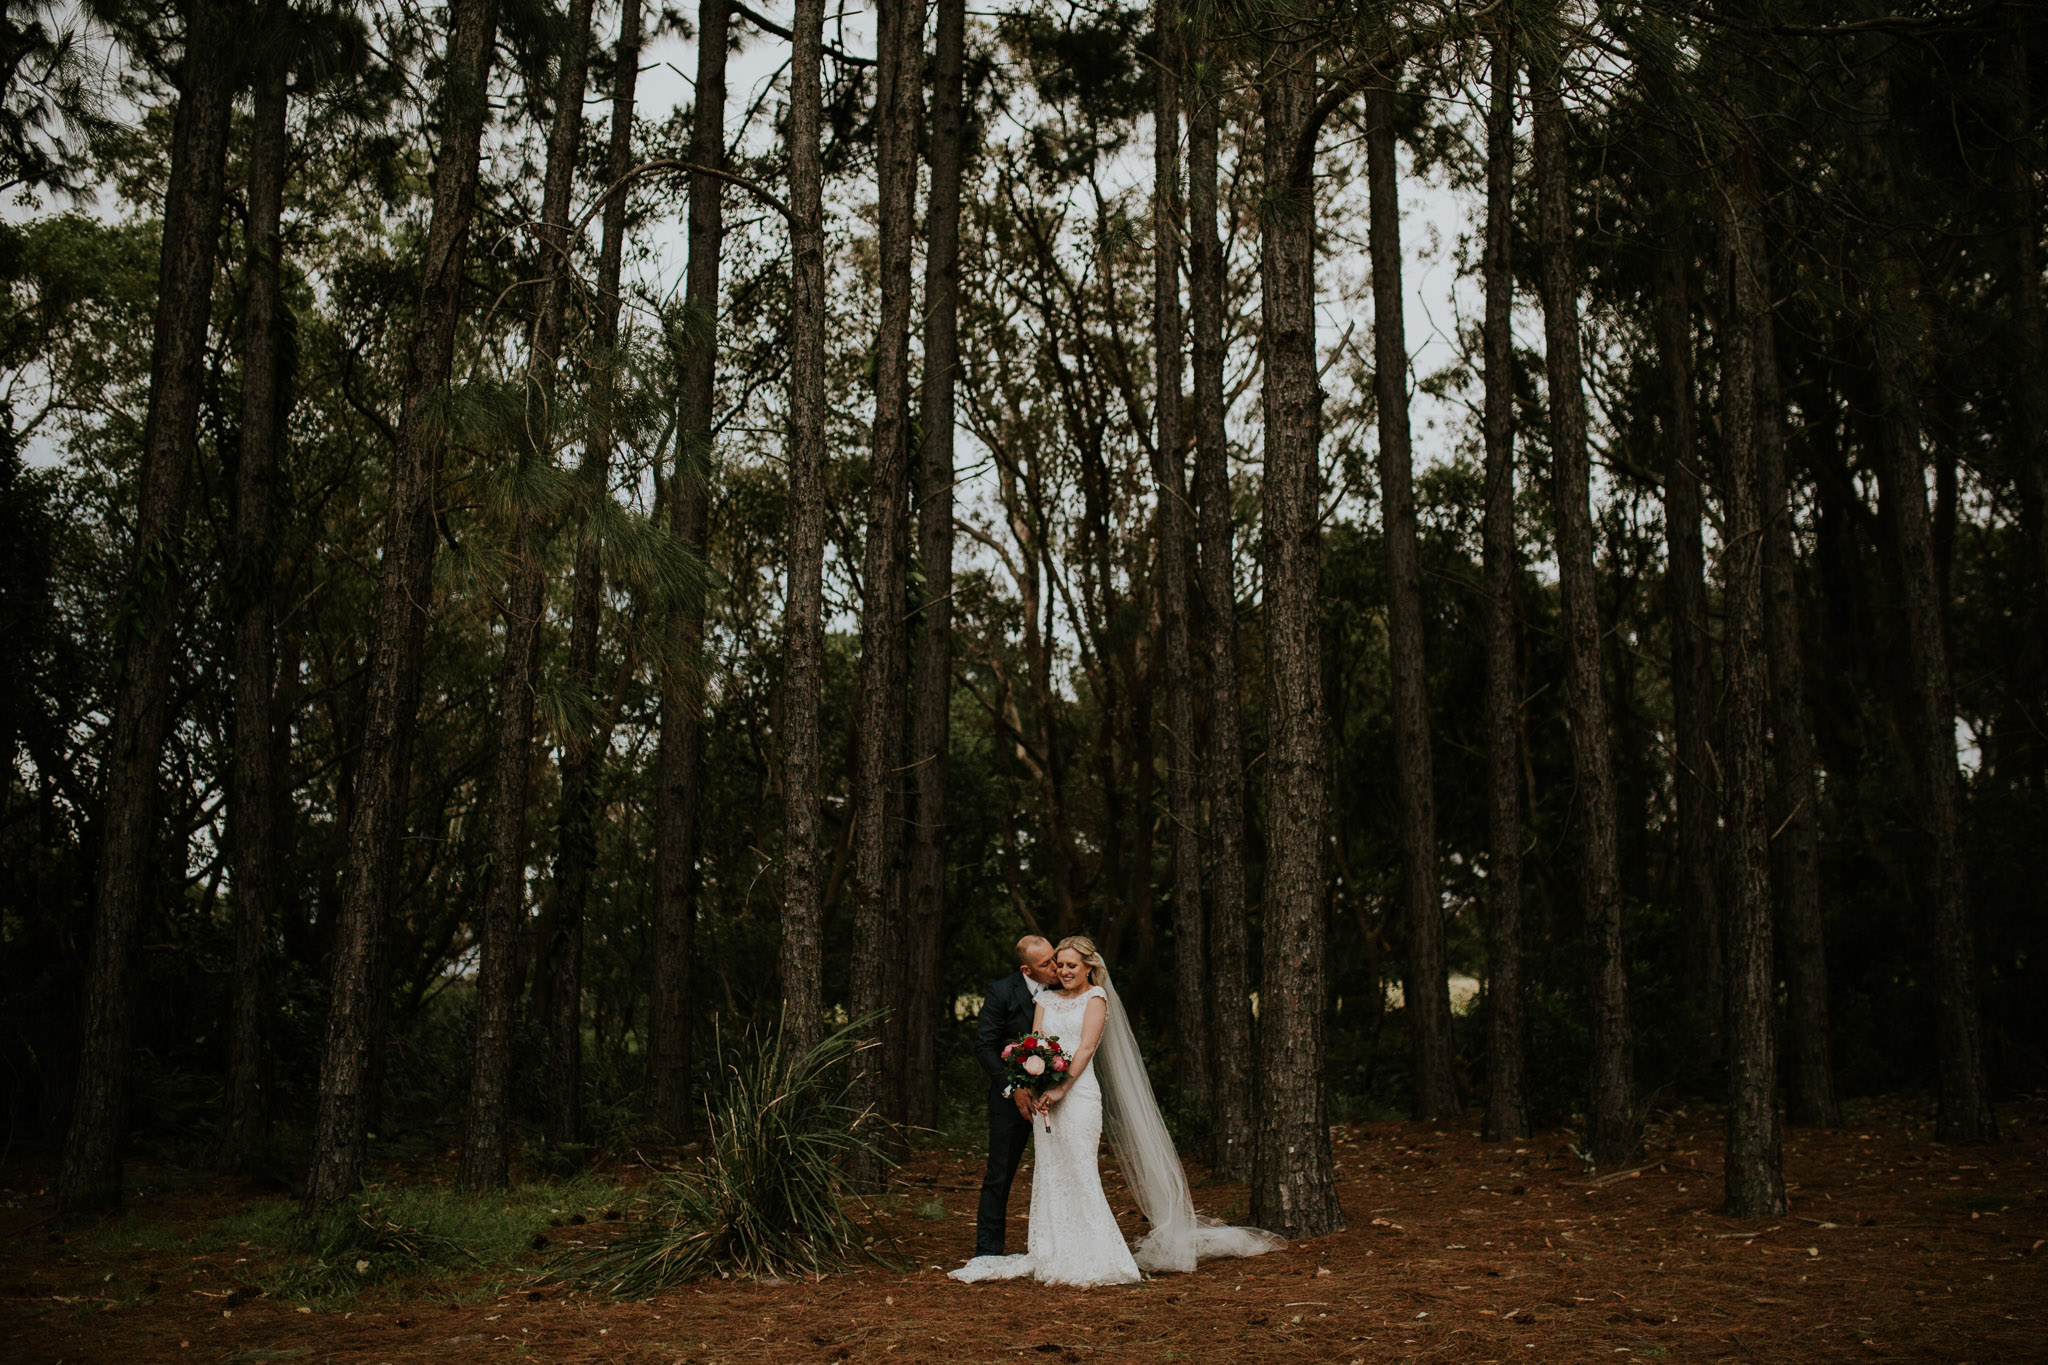 Shanan & Traci_Portkembla Golf Course Wedding-74.jpg